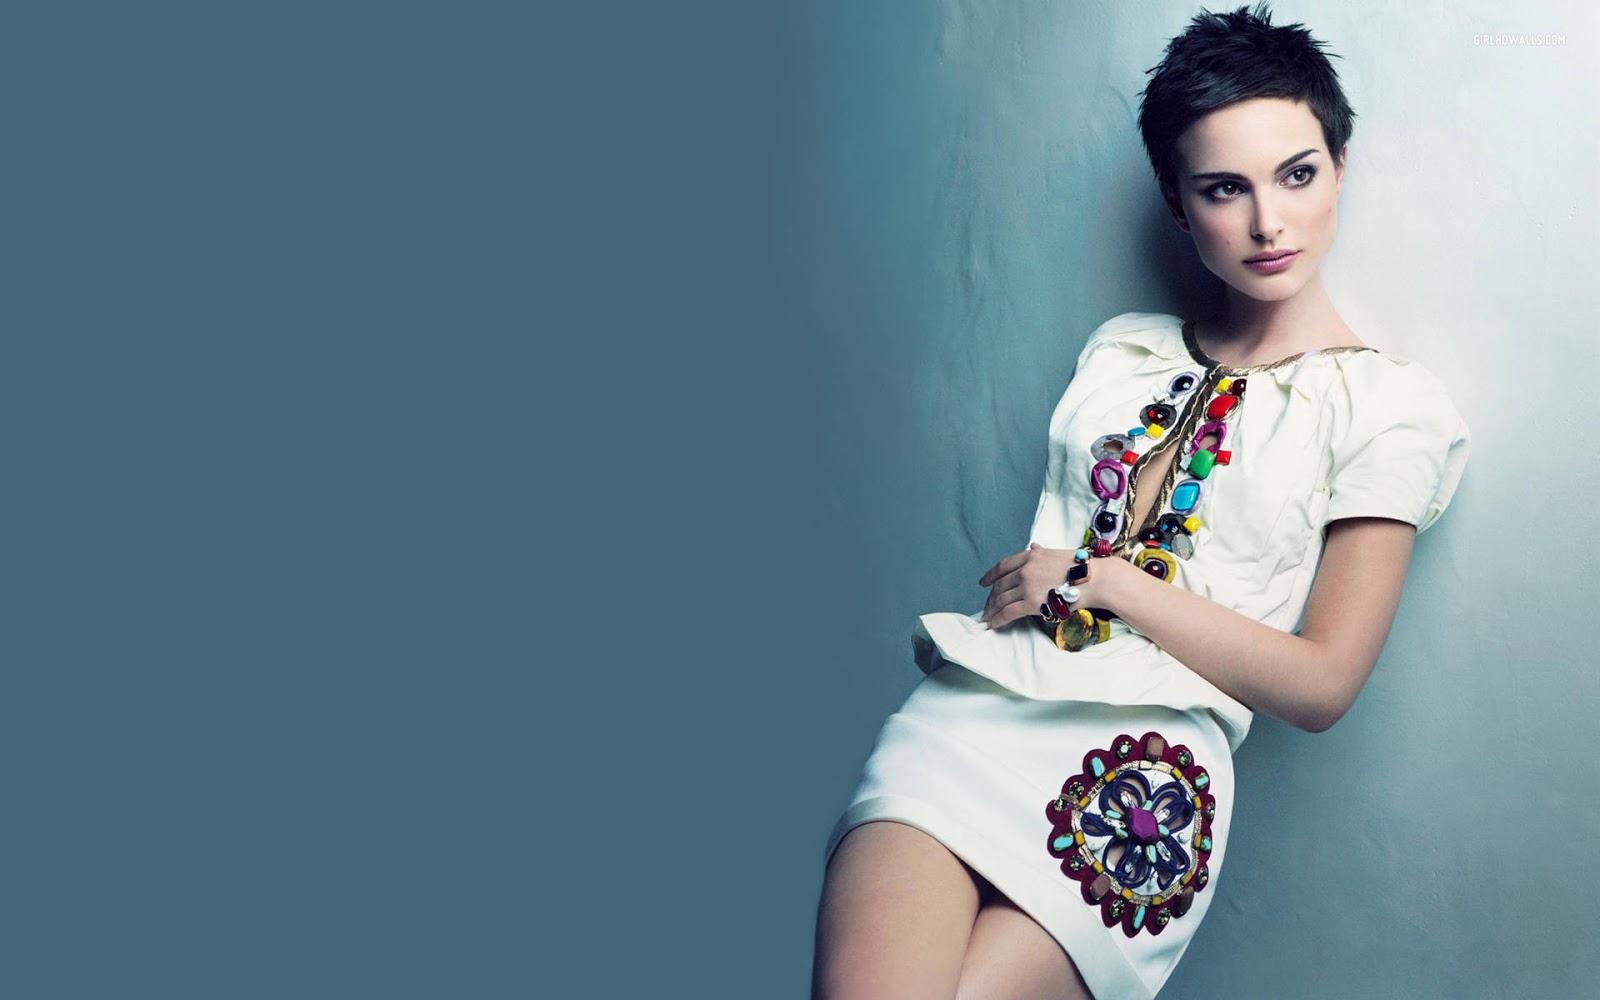 Natalie Portman Short Hair Wallpaper HD